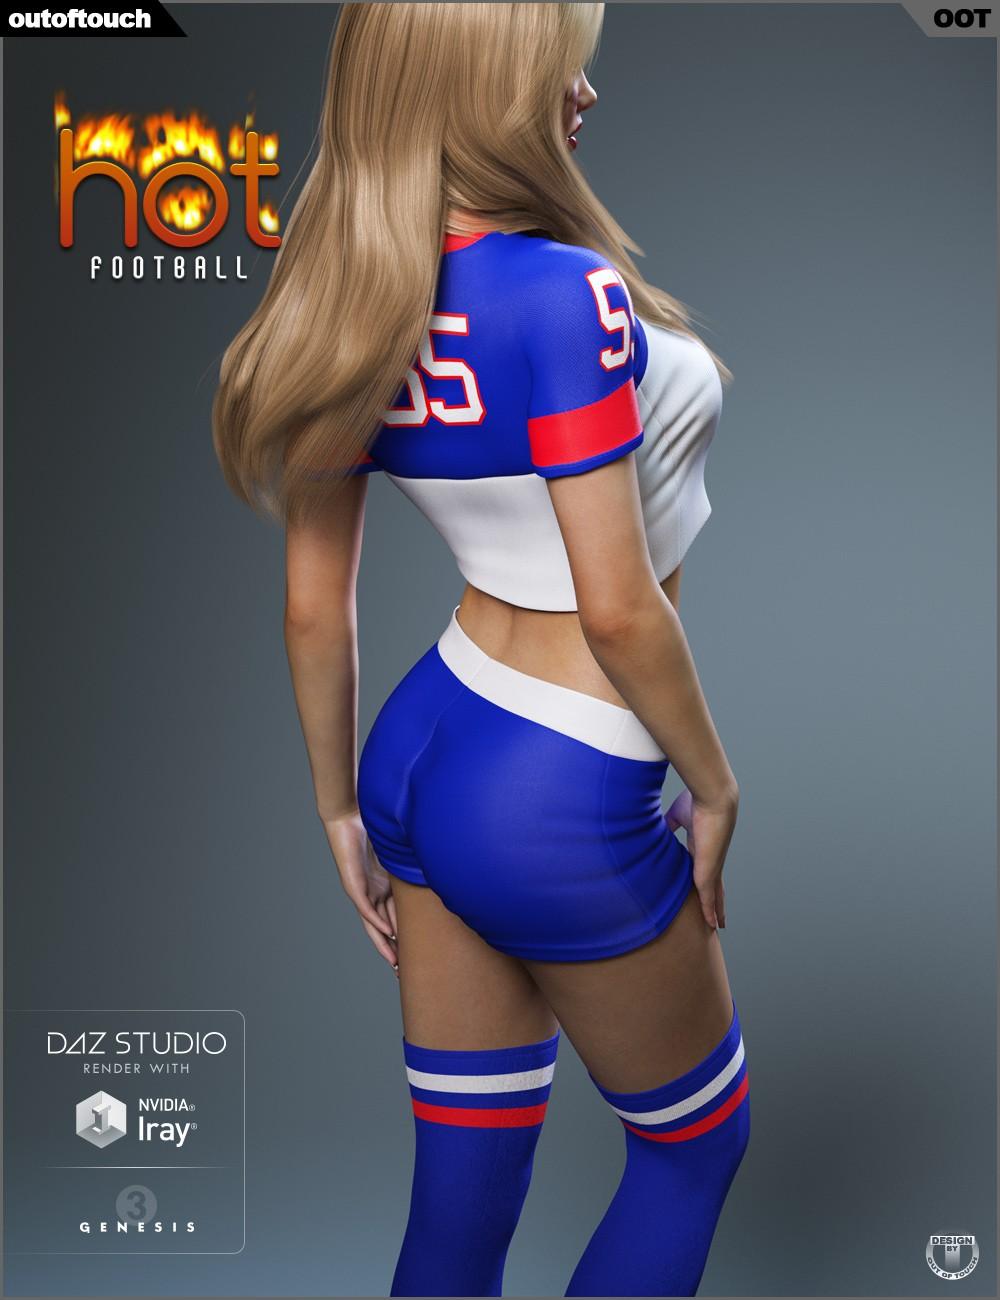 Download Daz Studio 3 For Free Daz 3D - Hot Football -4167